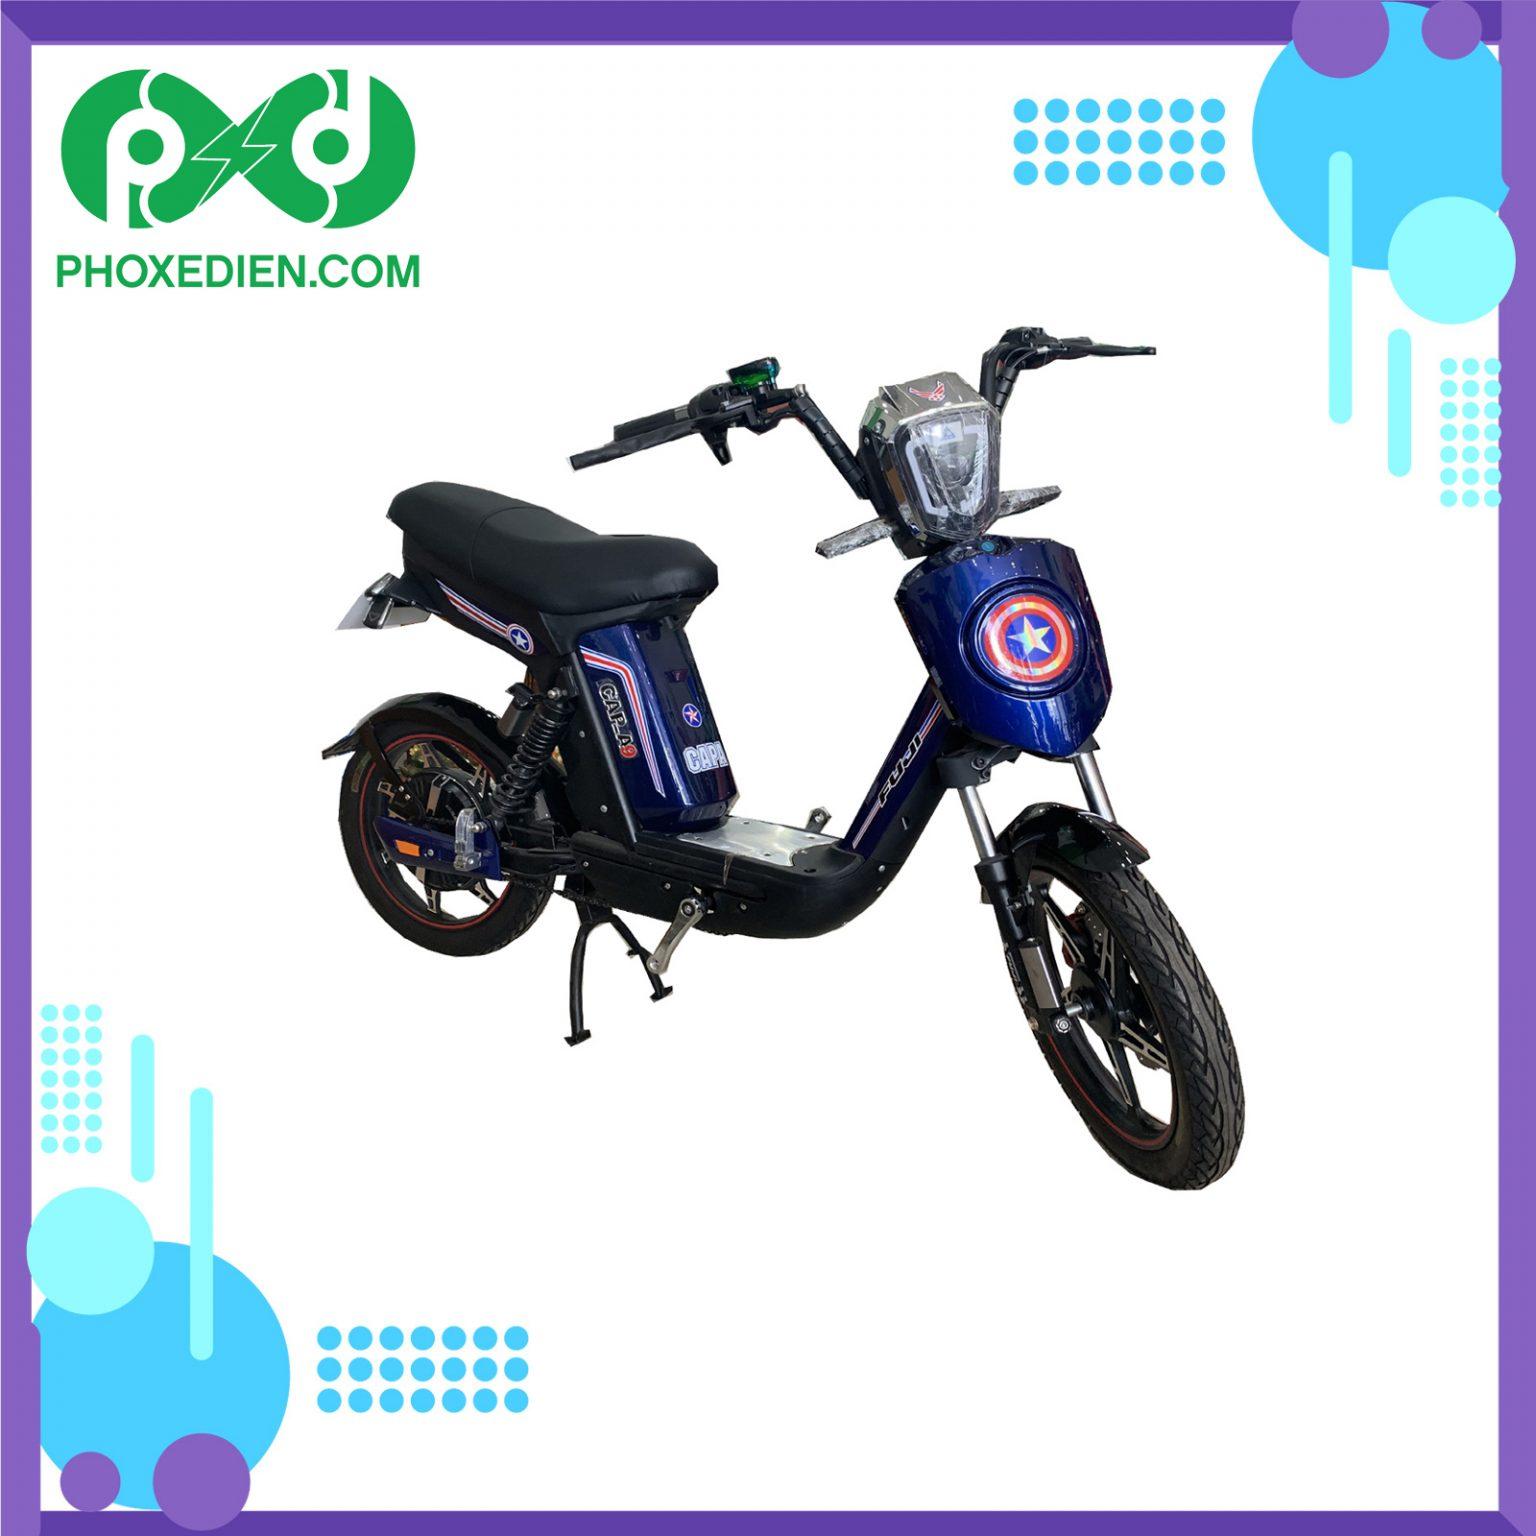 Xe đạp điện fuij cap a9 - màu xanh phoxedien.com